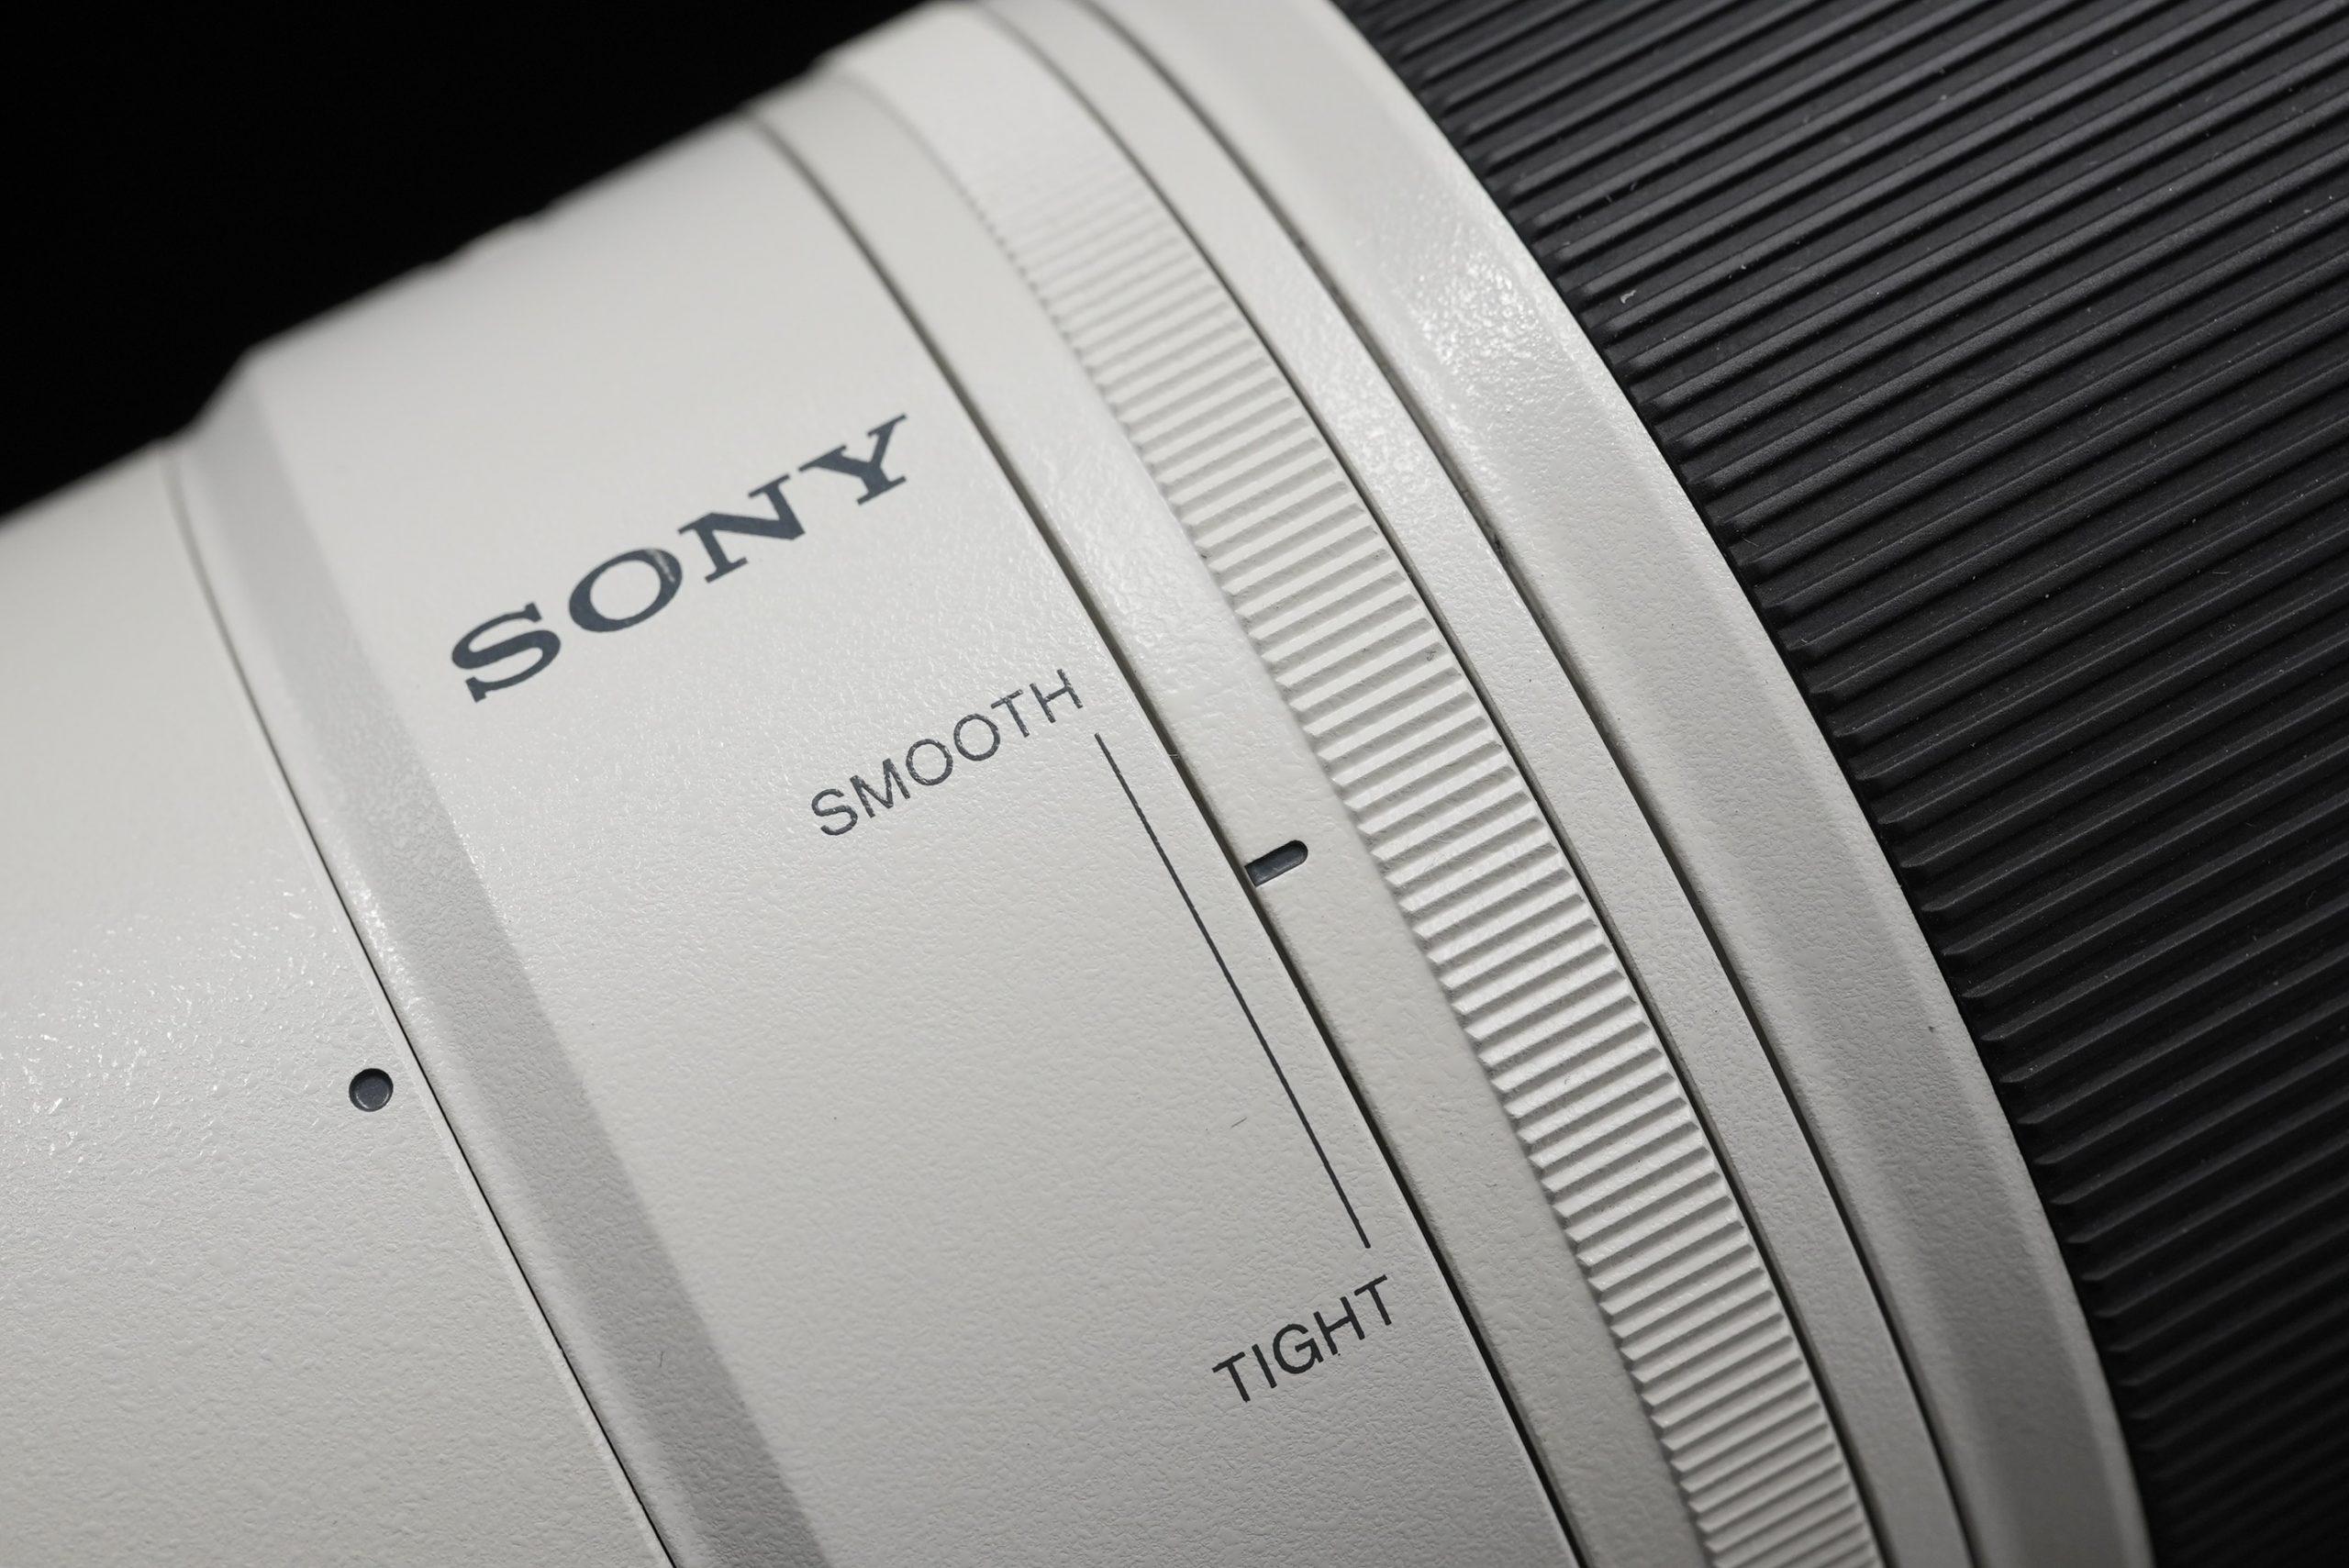 【SONY】Camera Technique Vol.18 FE 100-400mm F4.5-5.6 GM OSSの便利機能